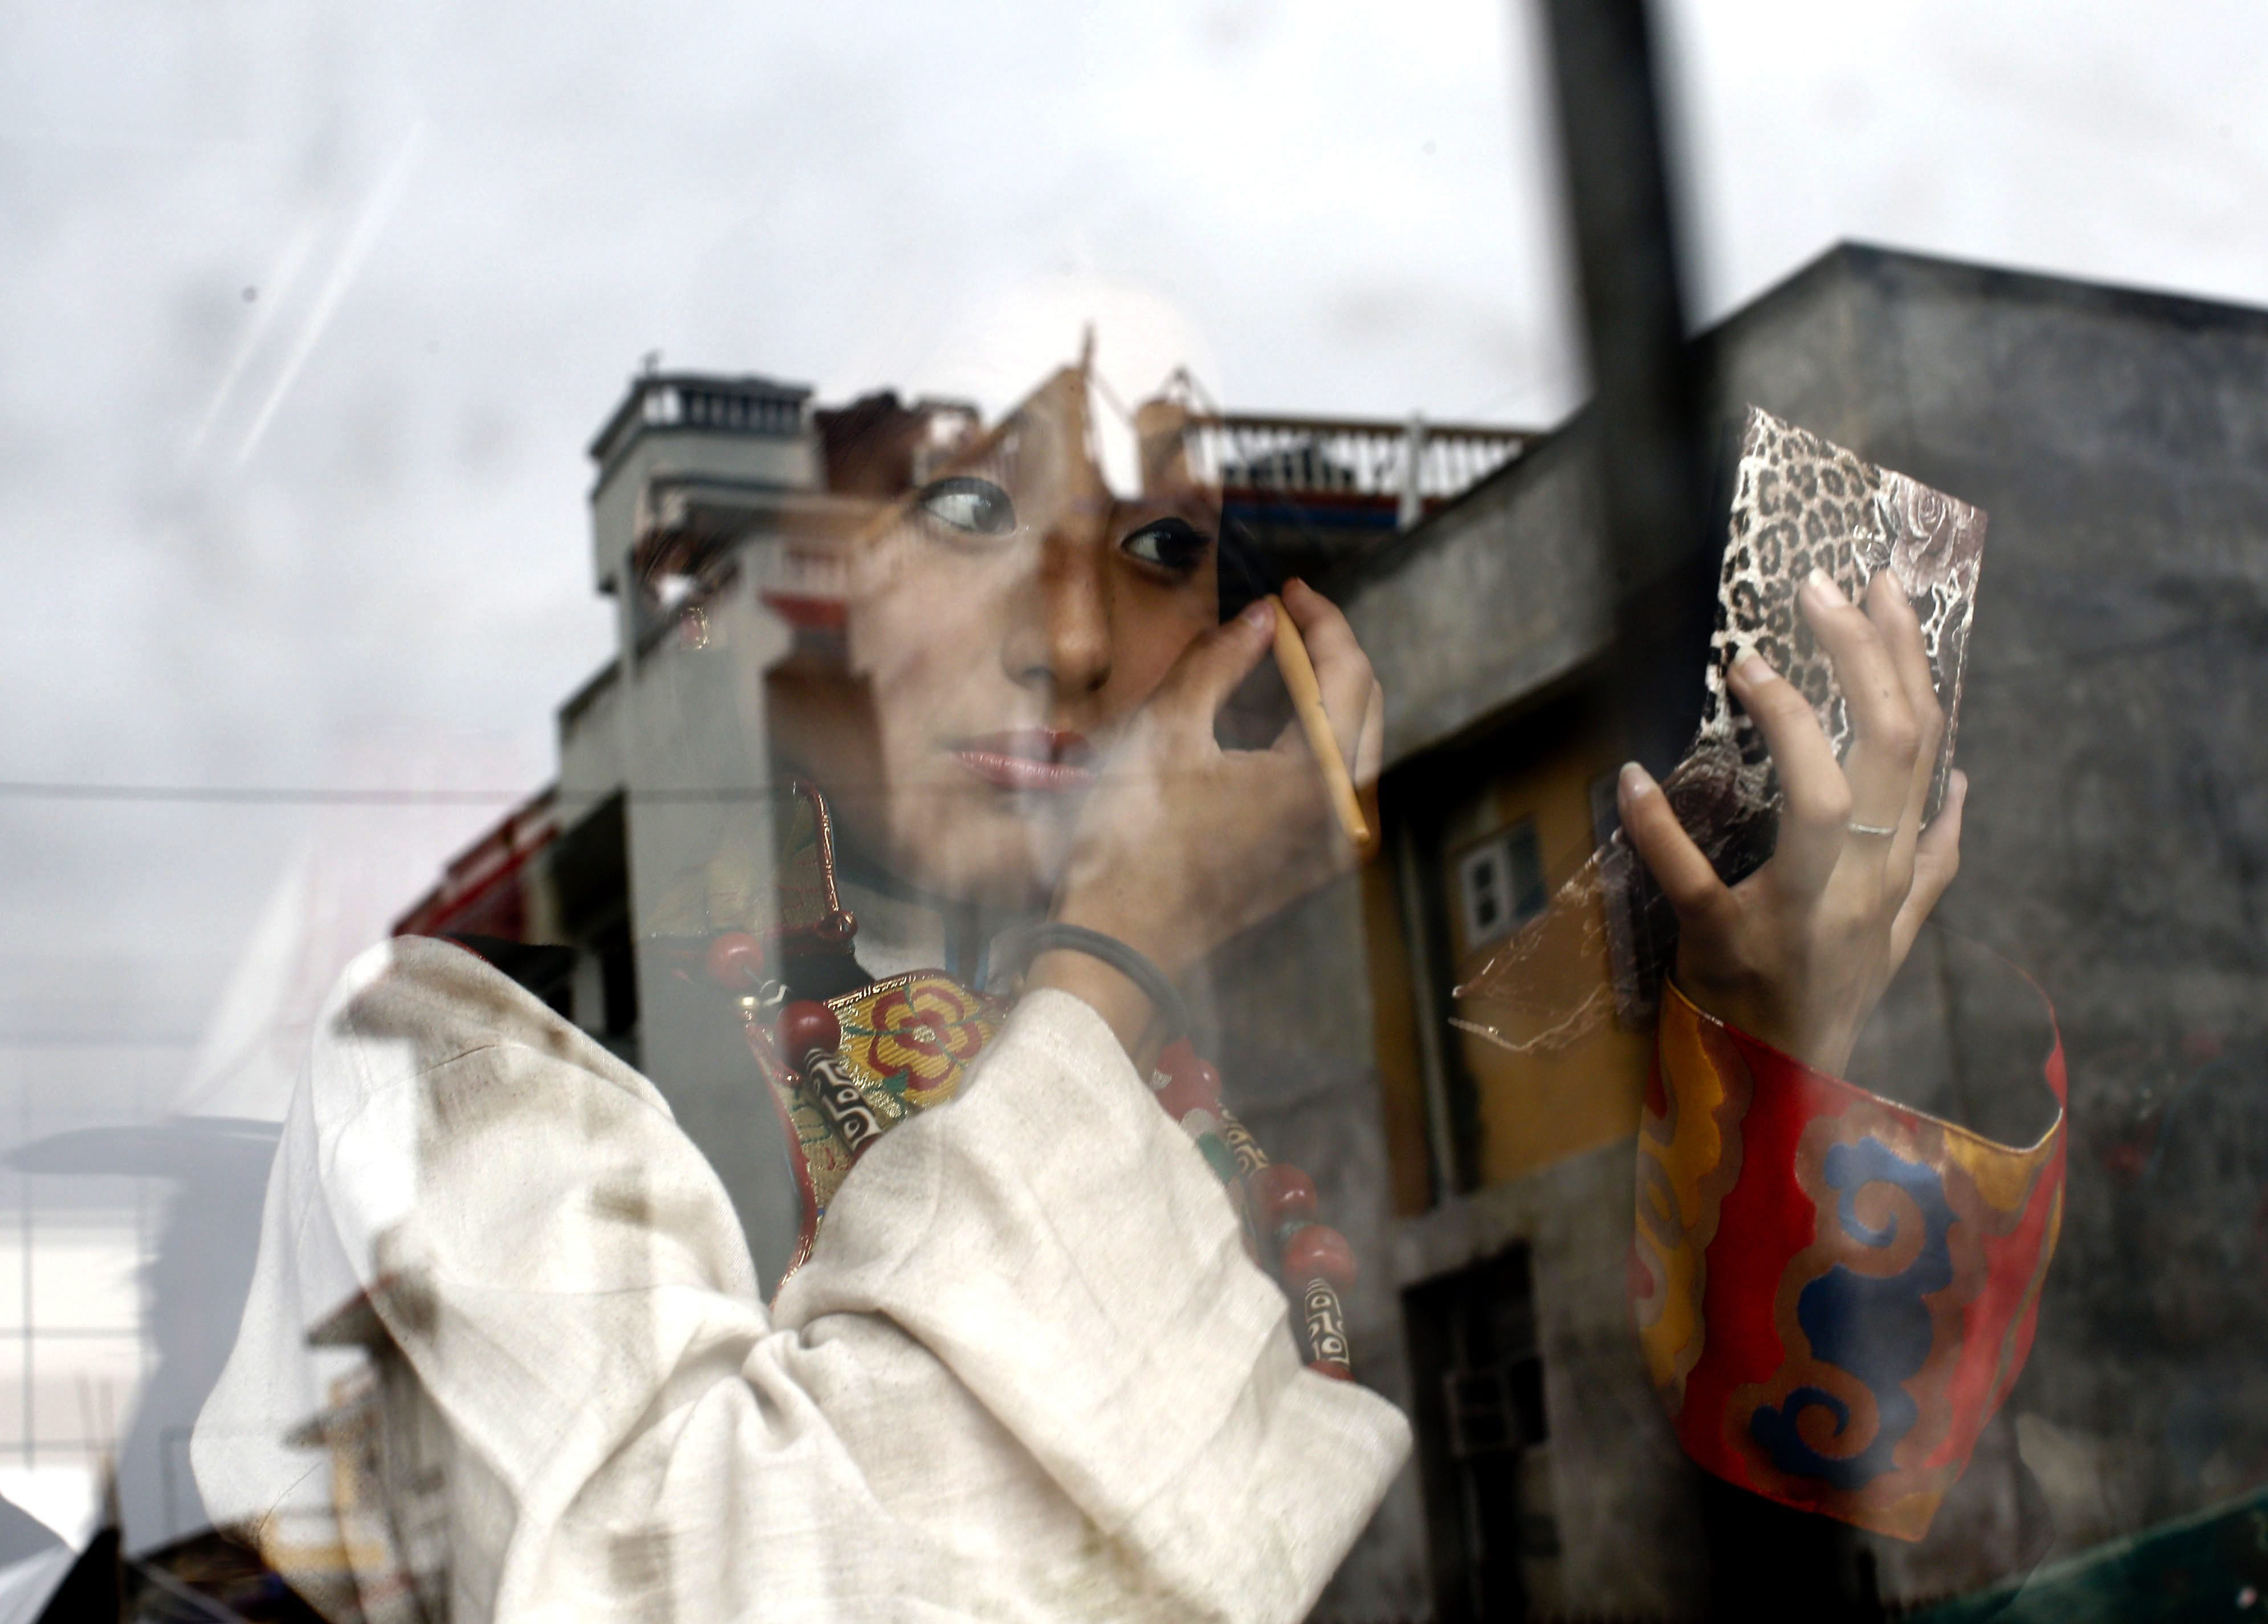 A Tibetan girl puts on make up before the Dalai Lama's 80th birthday at Namgyal School  in Kathmandu on July 6, 2015.